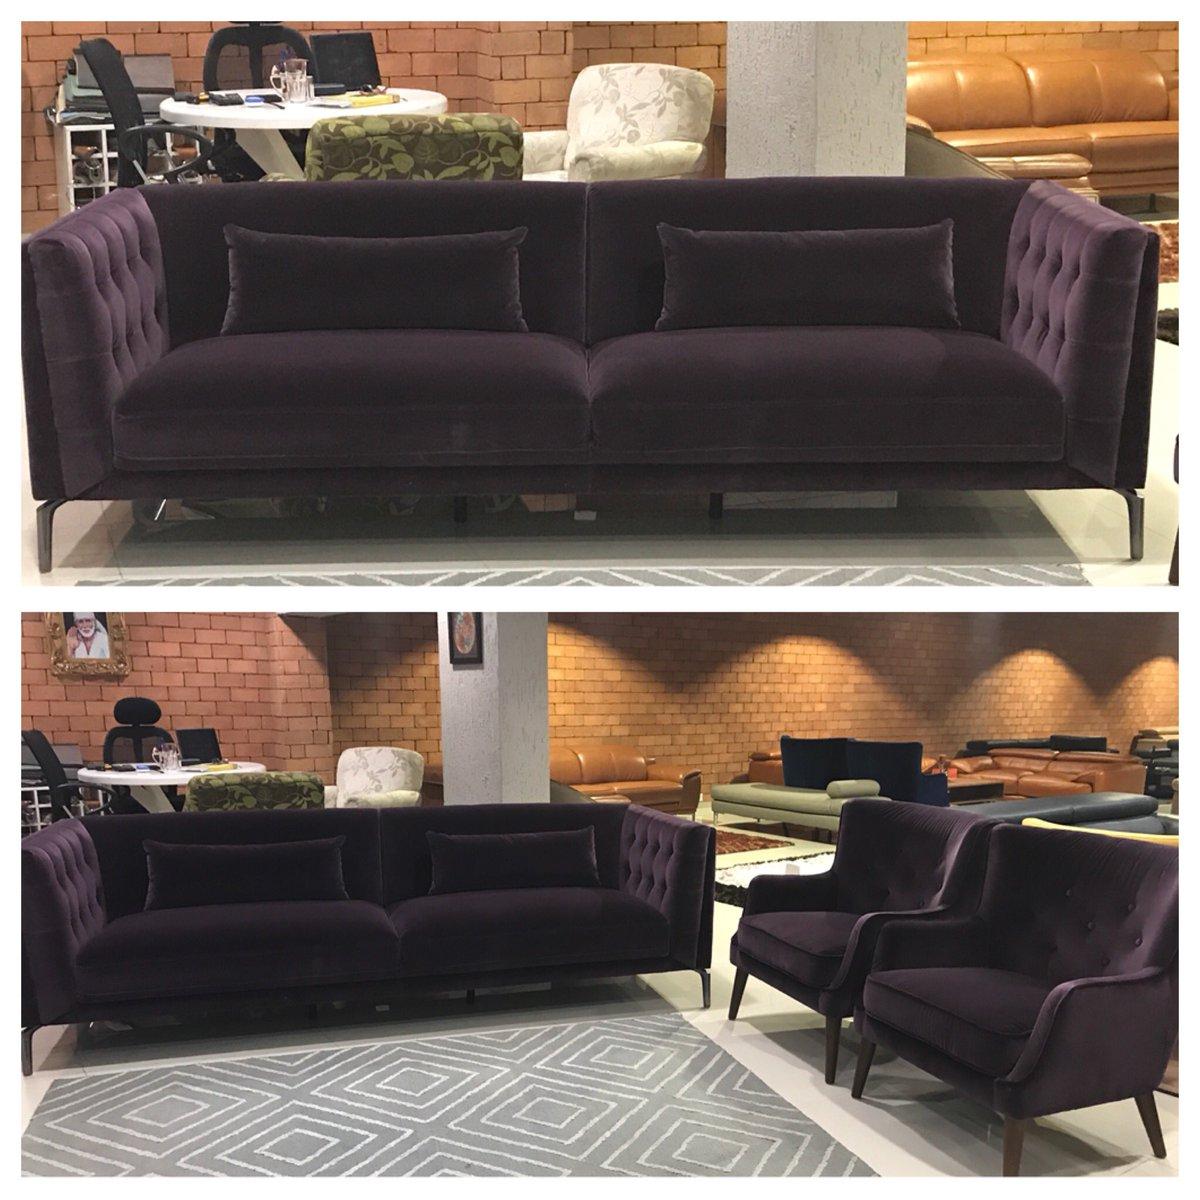 The Couch Potato On Twitter Sao Paulo Sofa Set Just